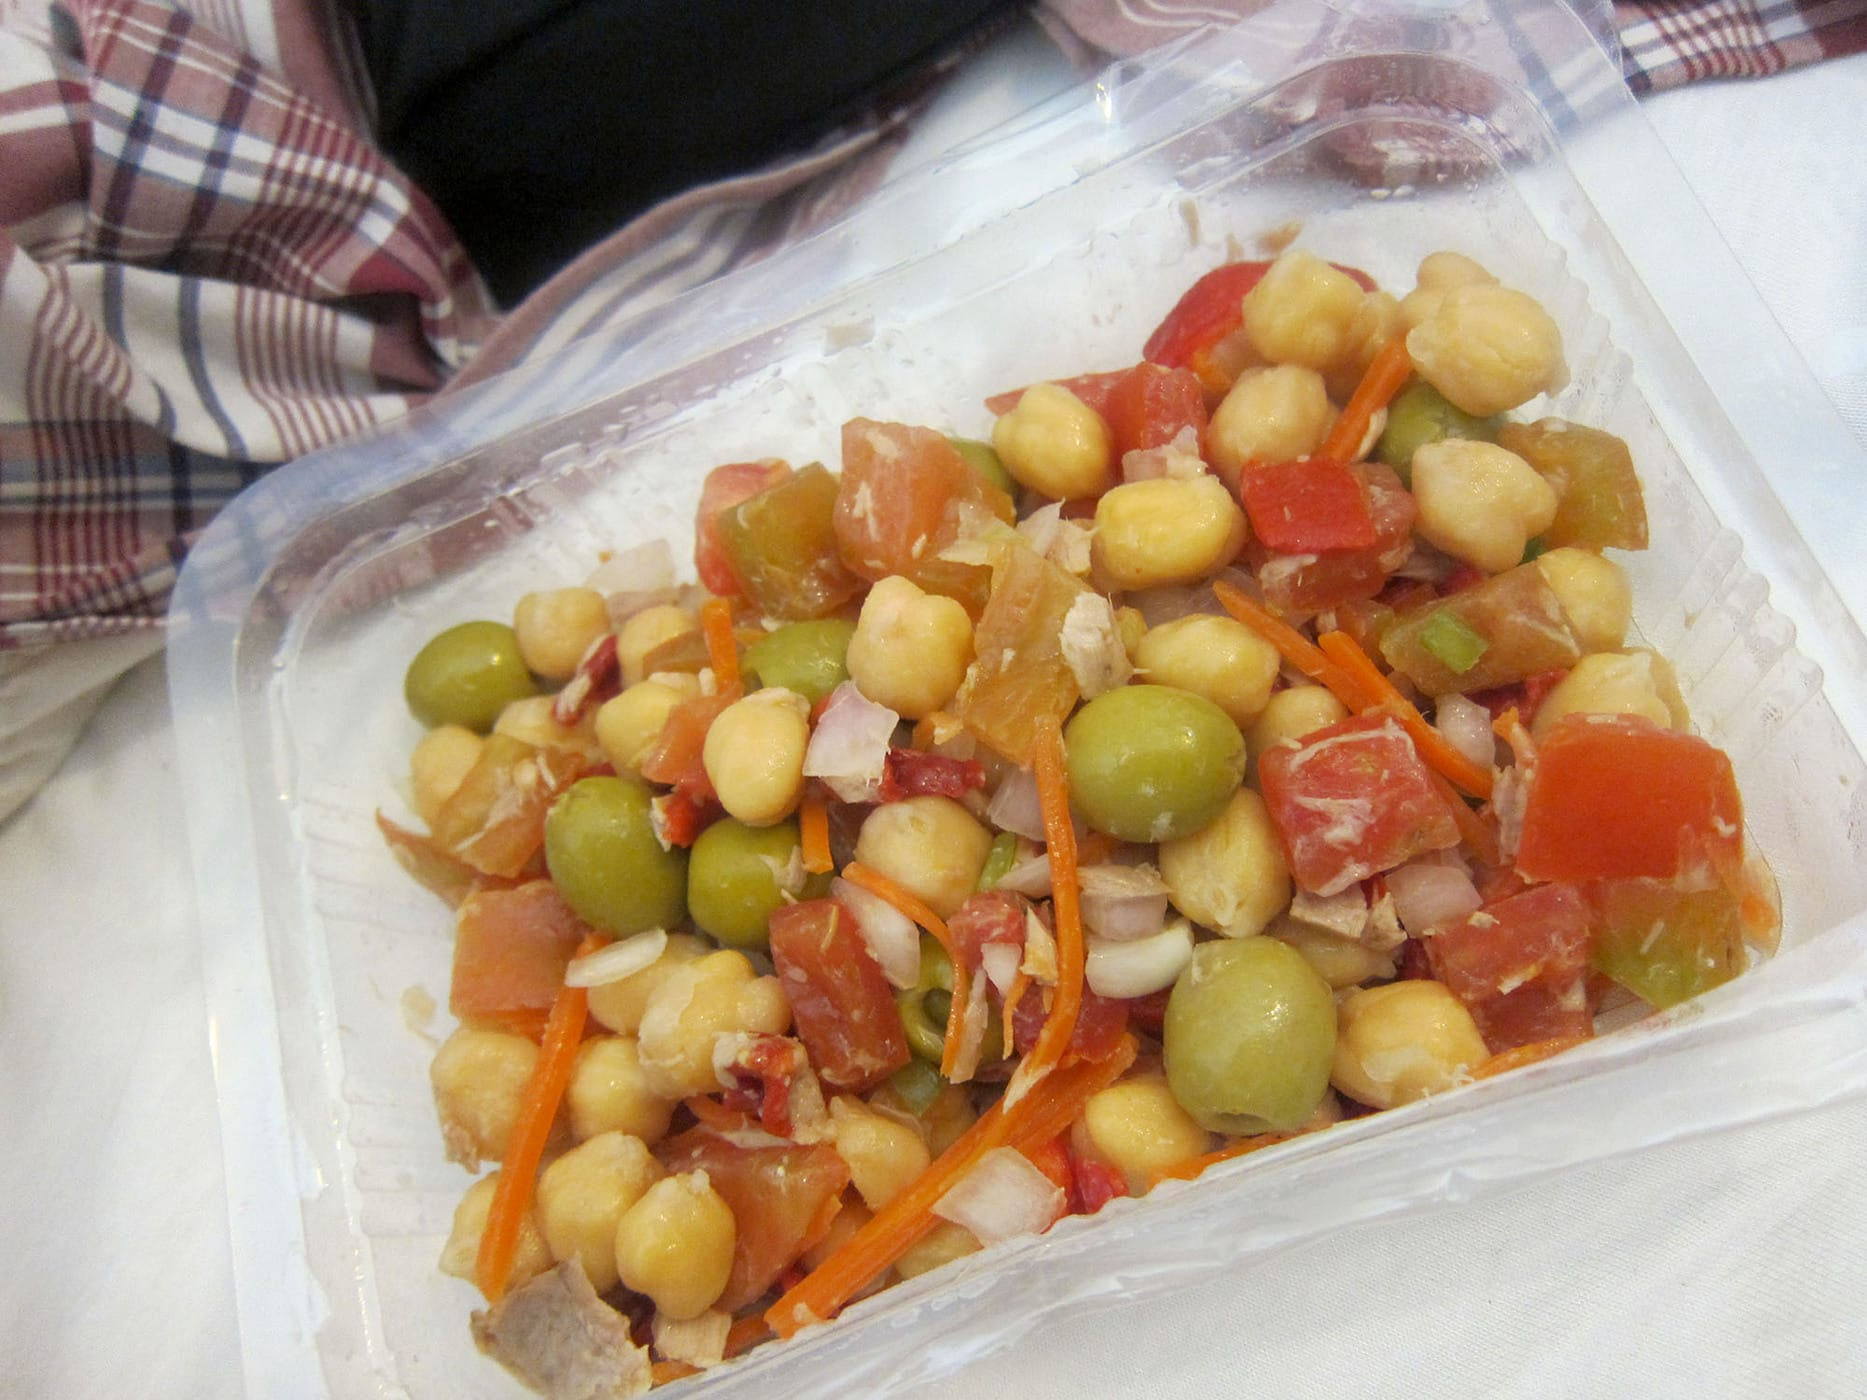 Salad from Mercat de Sant Josep de La Boqueria in Barcelona, Spain.